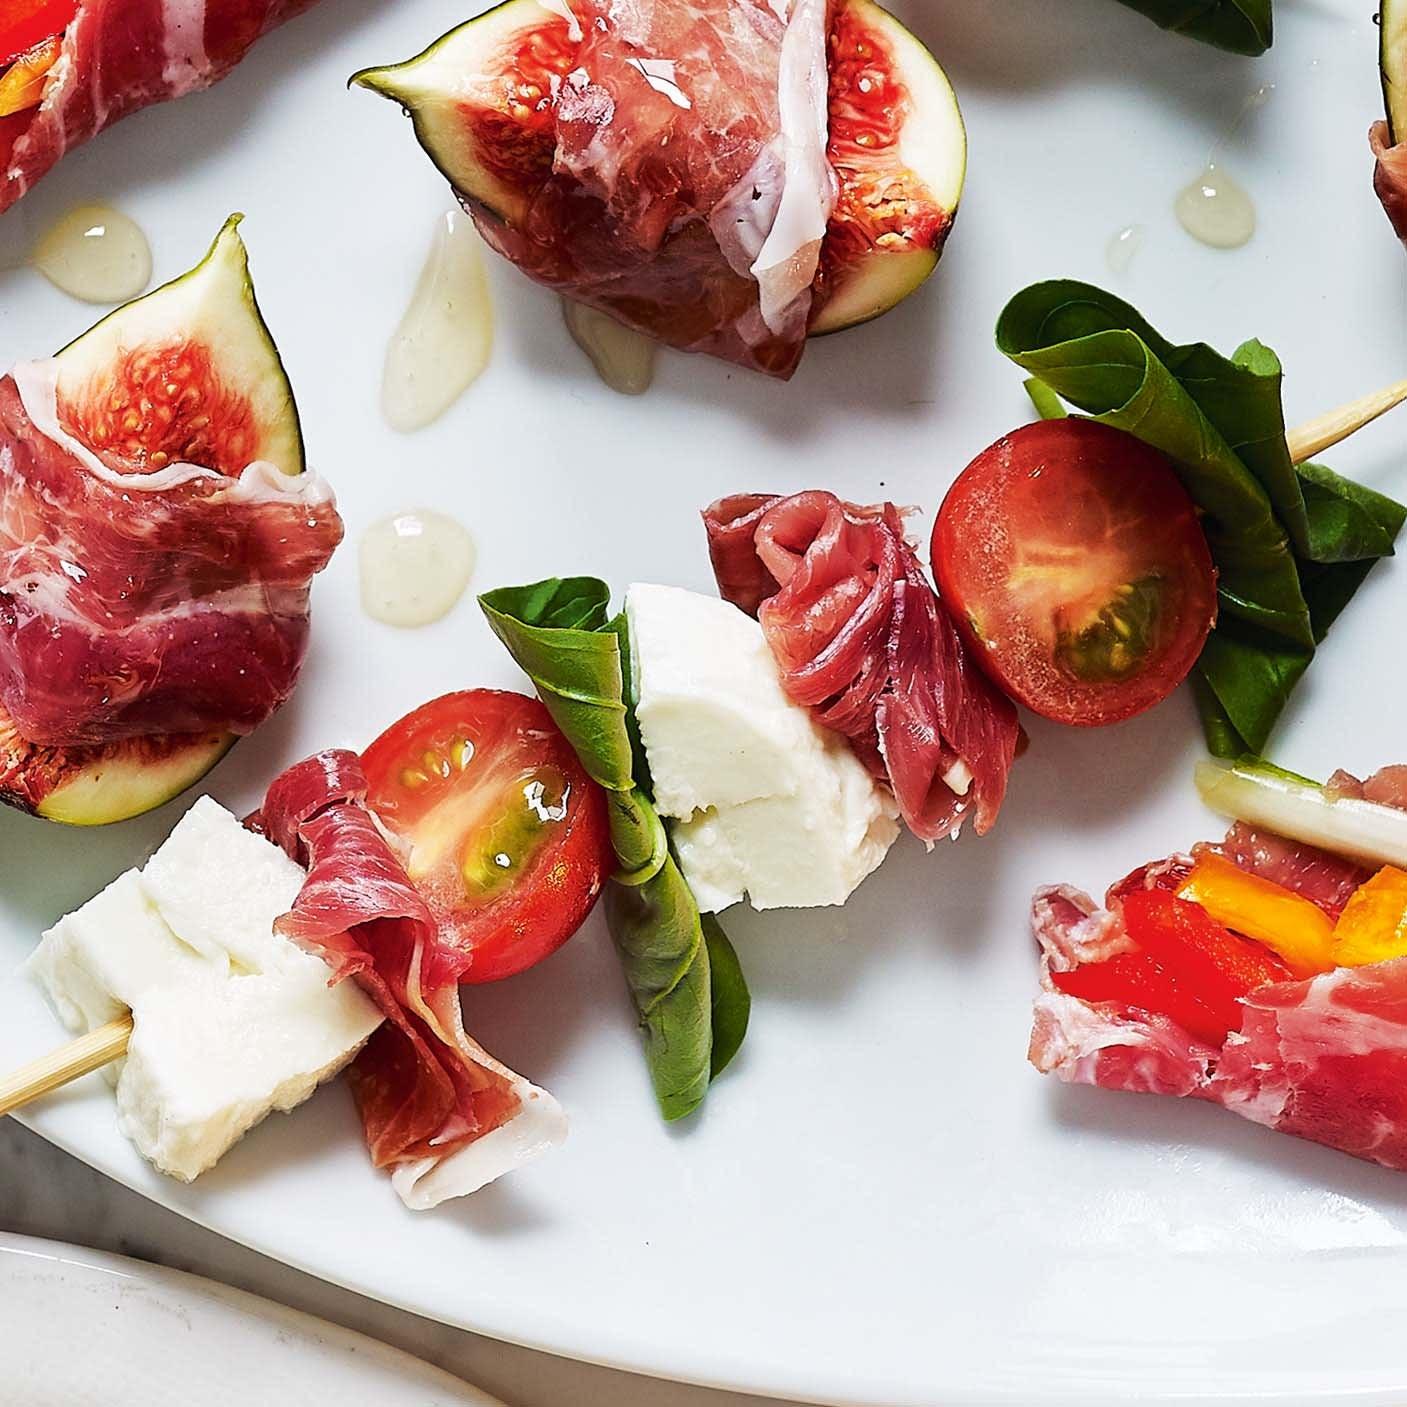 Photo of Parma ham, tomato & mozzarella skewers by WW